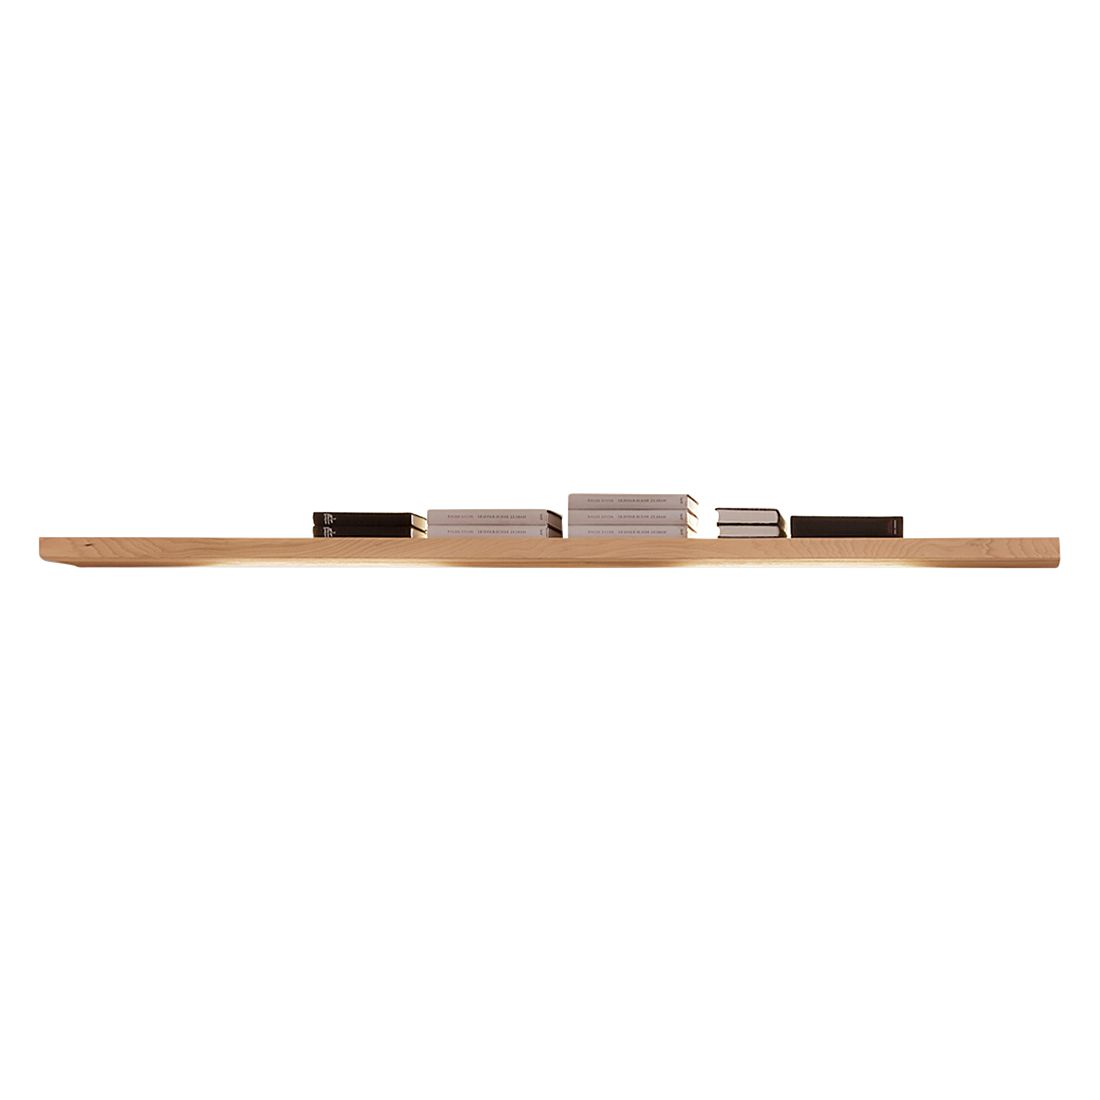 Wandboard Pecano II – Pecan-Nuss massiv – 132 x 4 cm – Mit Beleuchtung, Hartmann jetzt kaufen